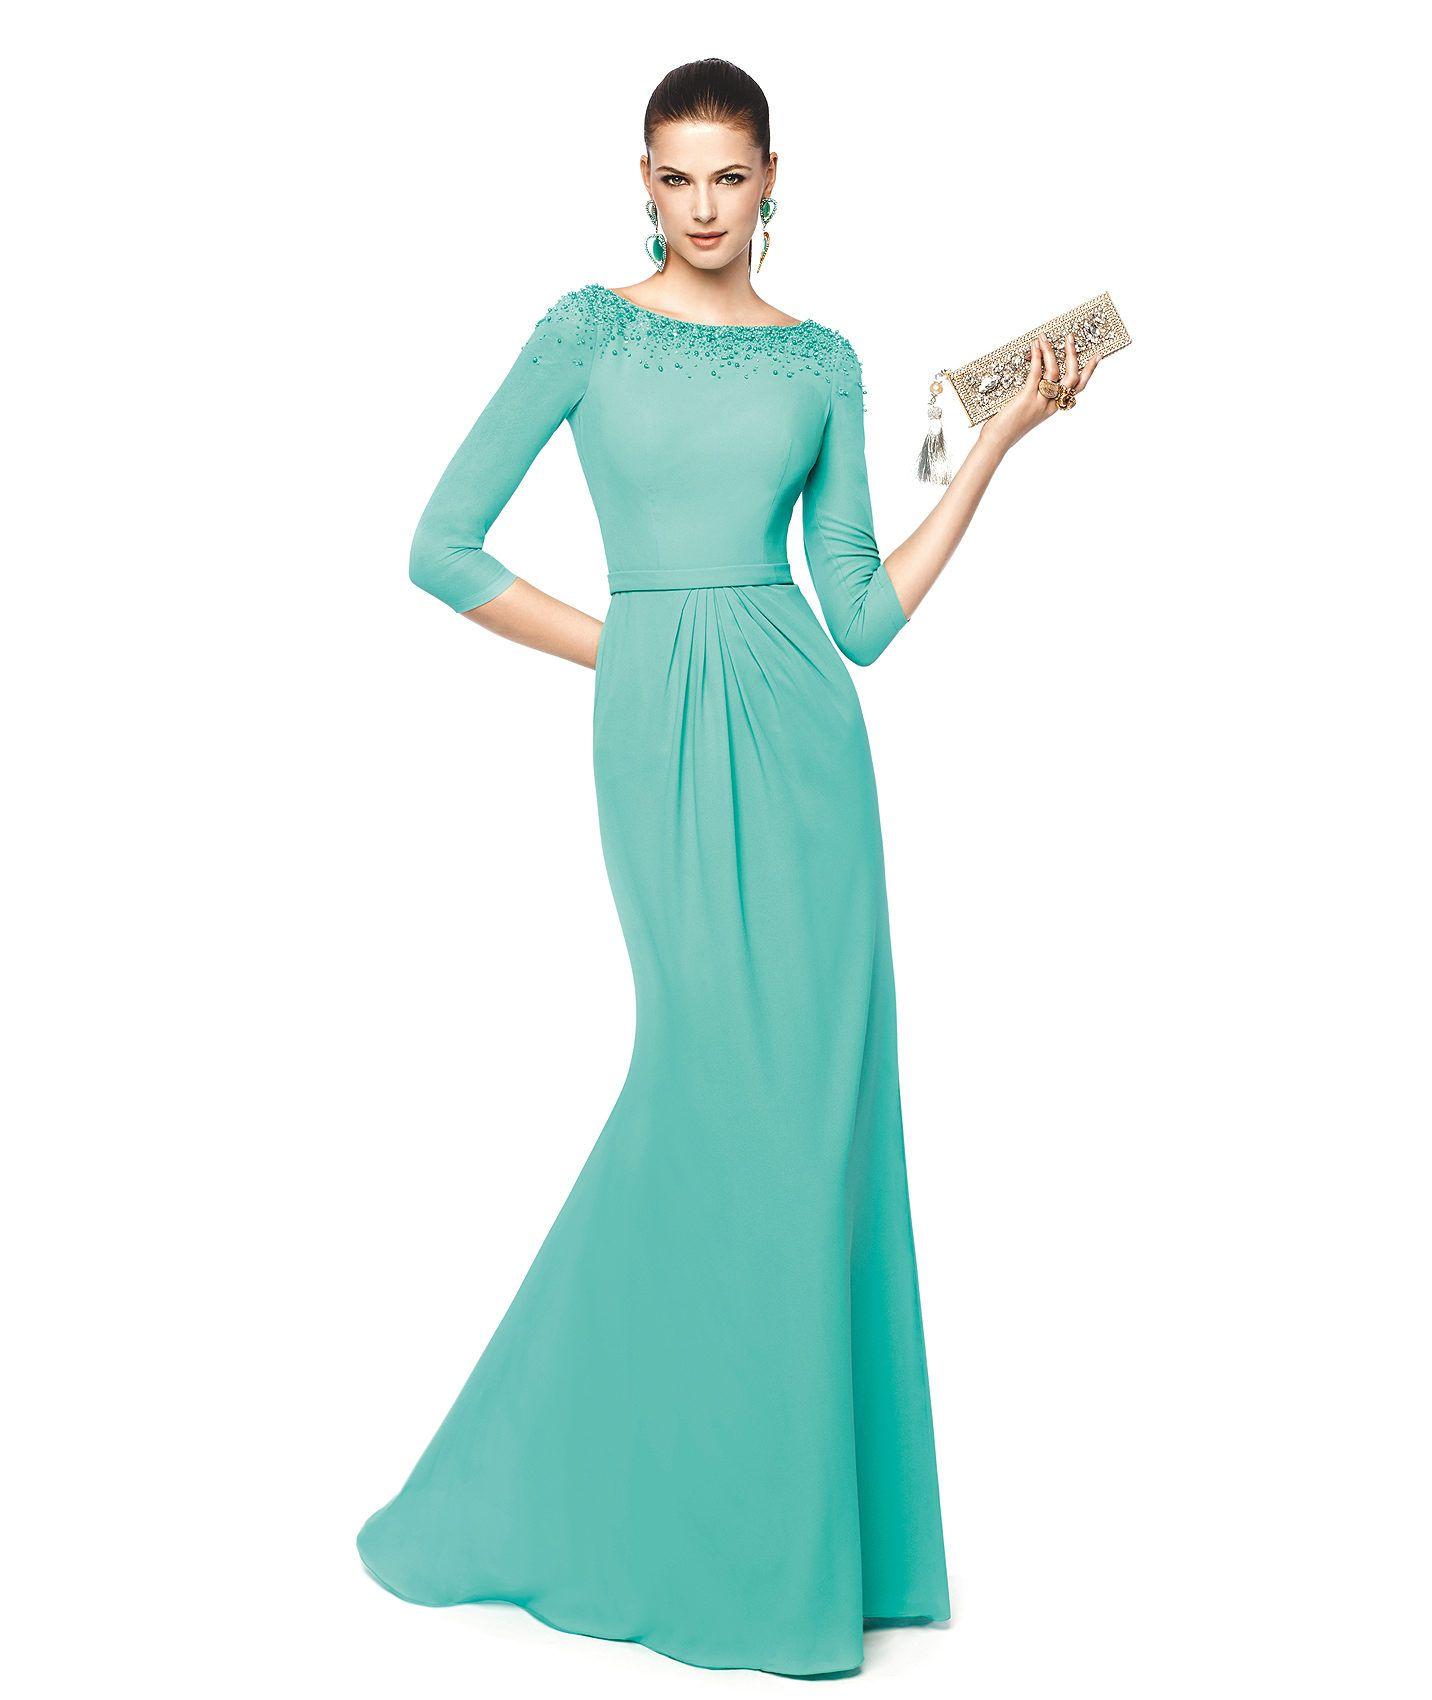 Vestidos de festa 2017/2016 | Pinterest | Classic elegance, Glamour ...